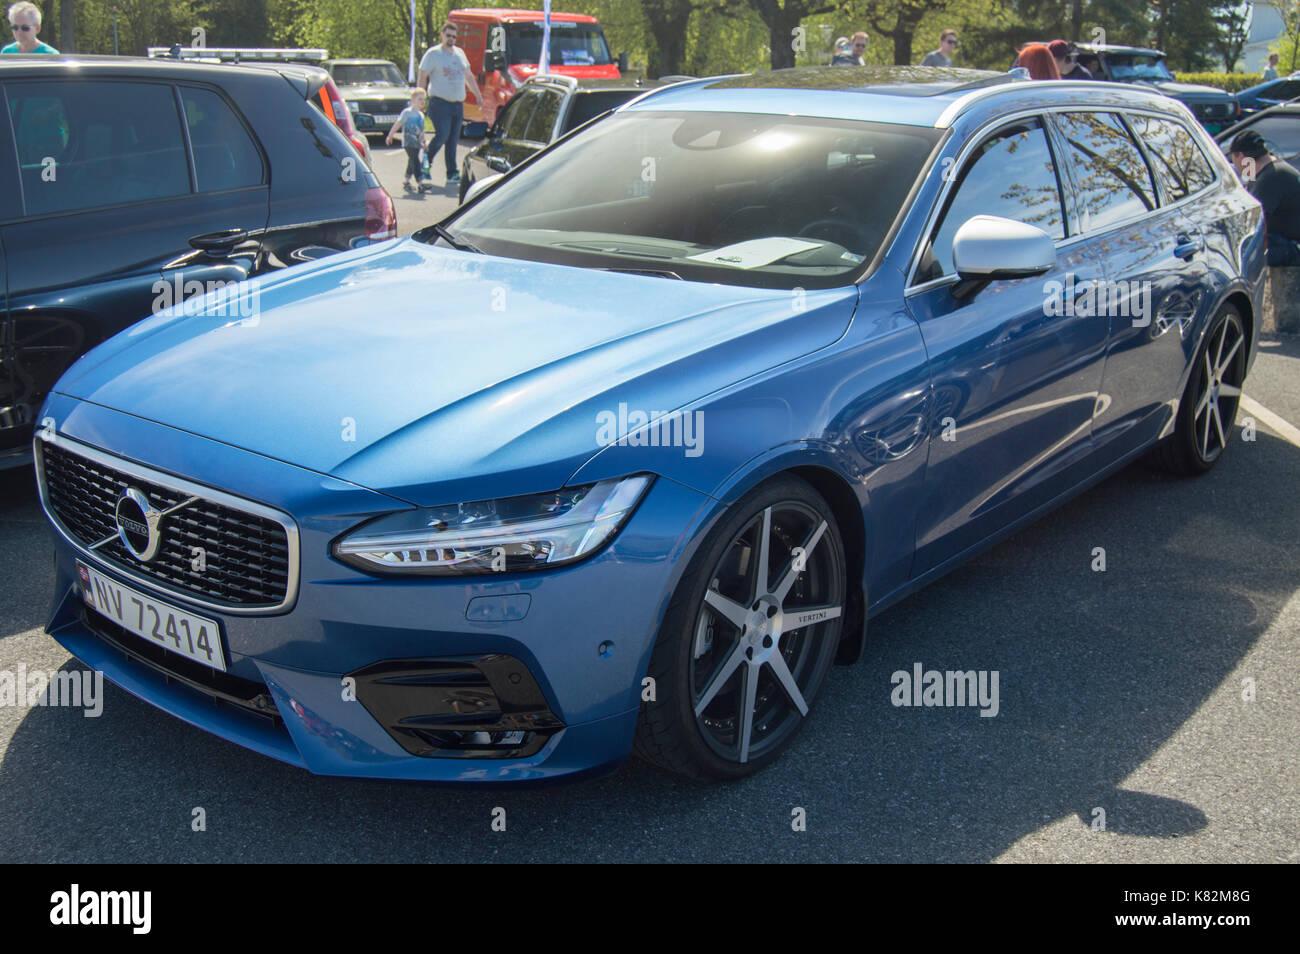 Bursting Blue Volvo V90 | Grenland Bilfestival 2017 - Stock Image